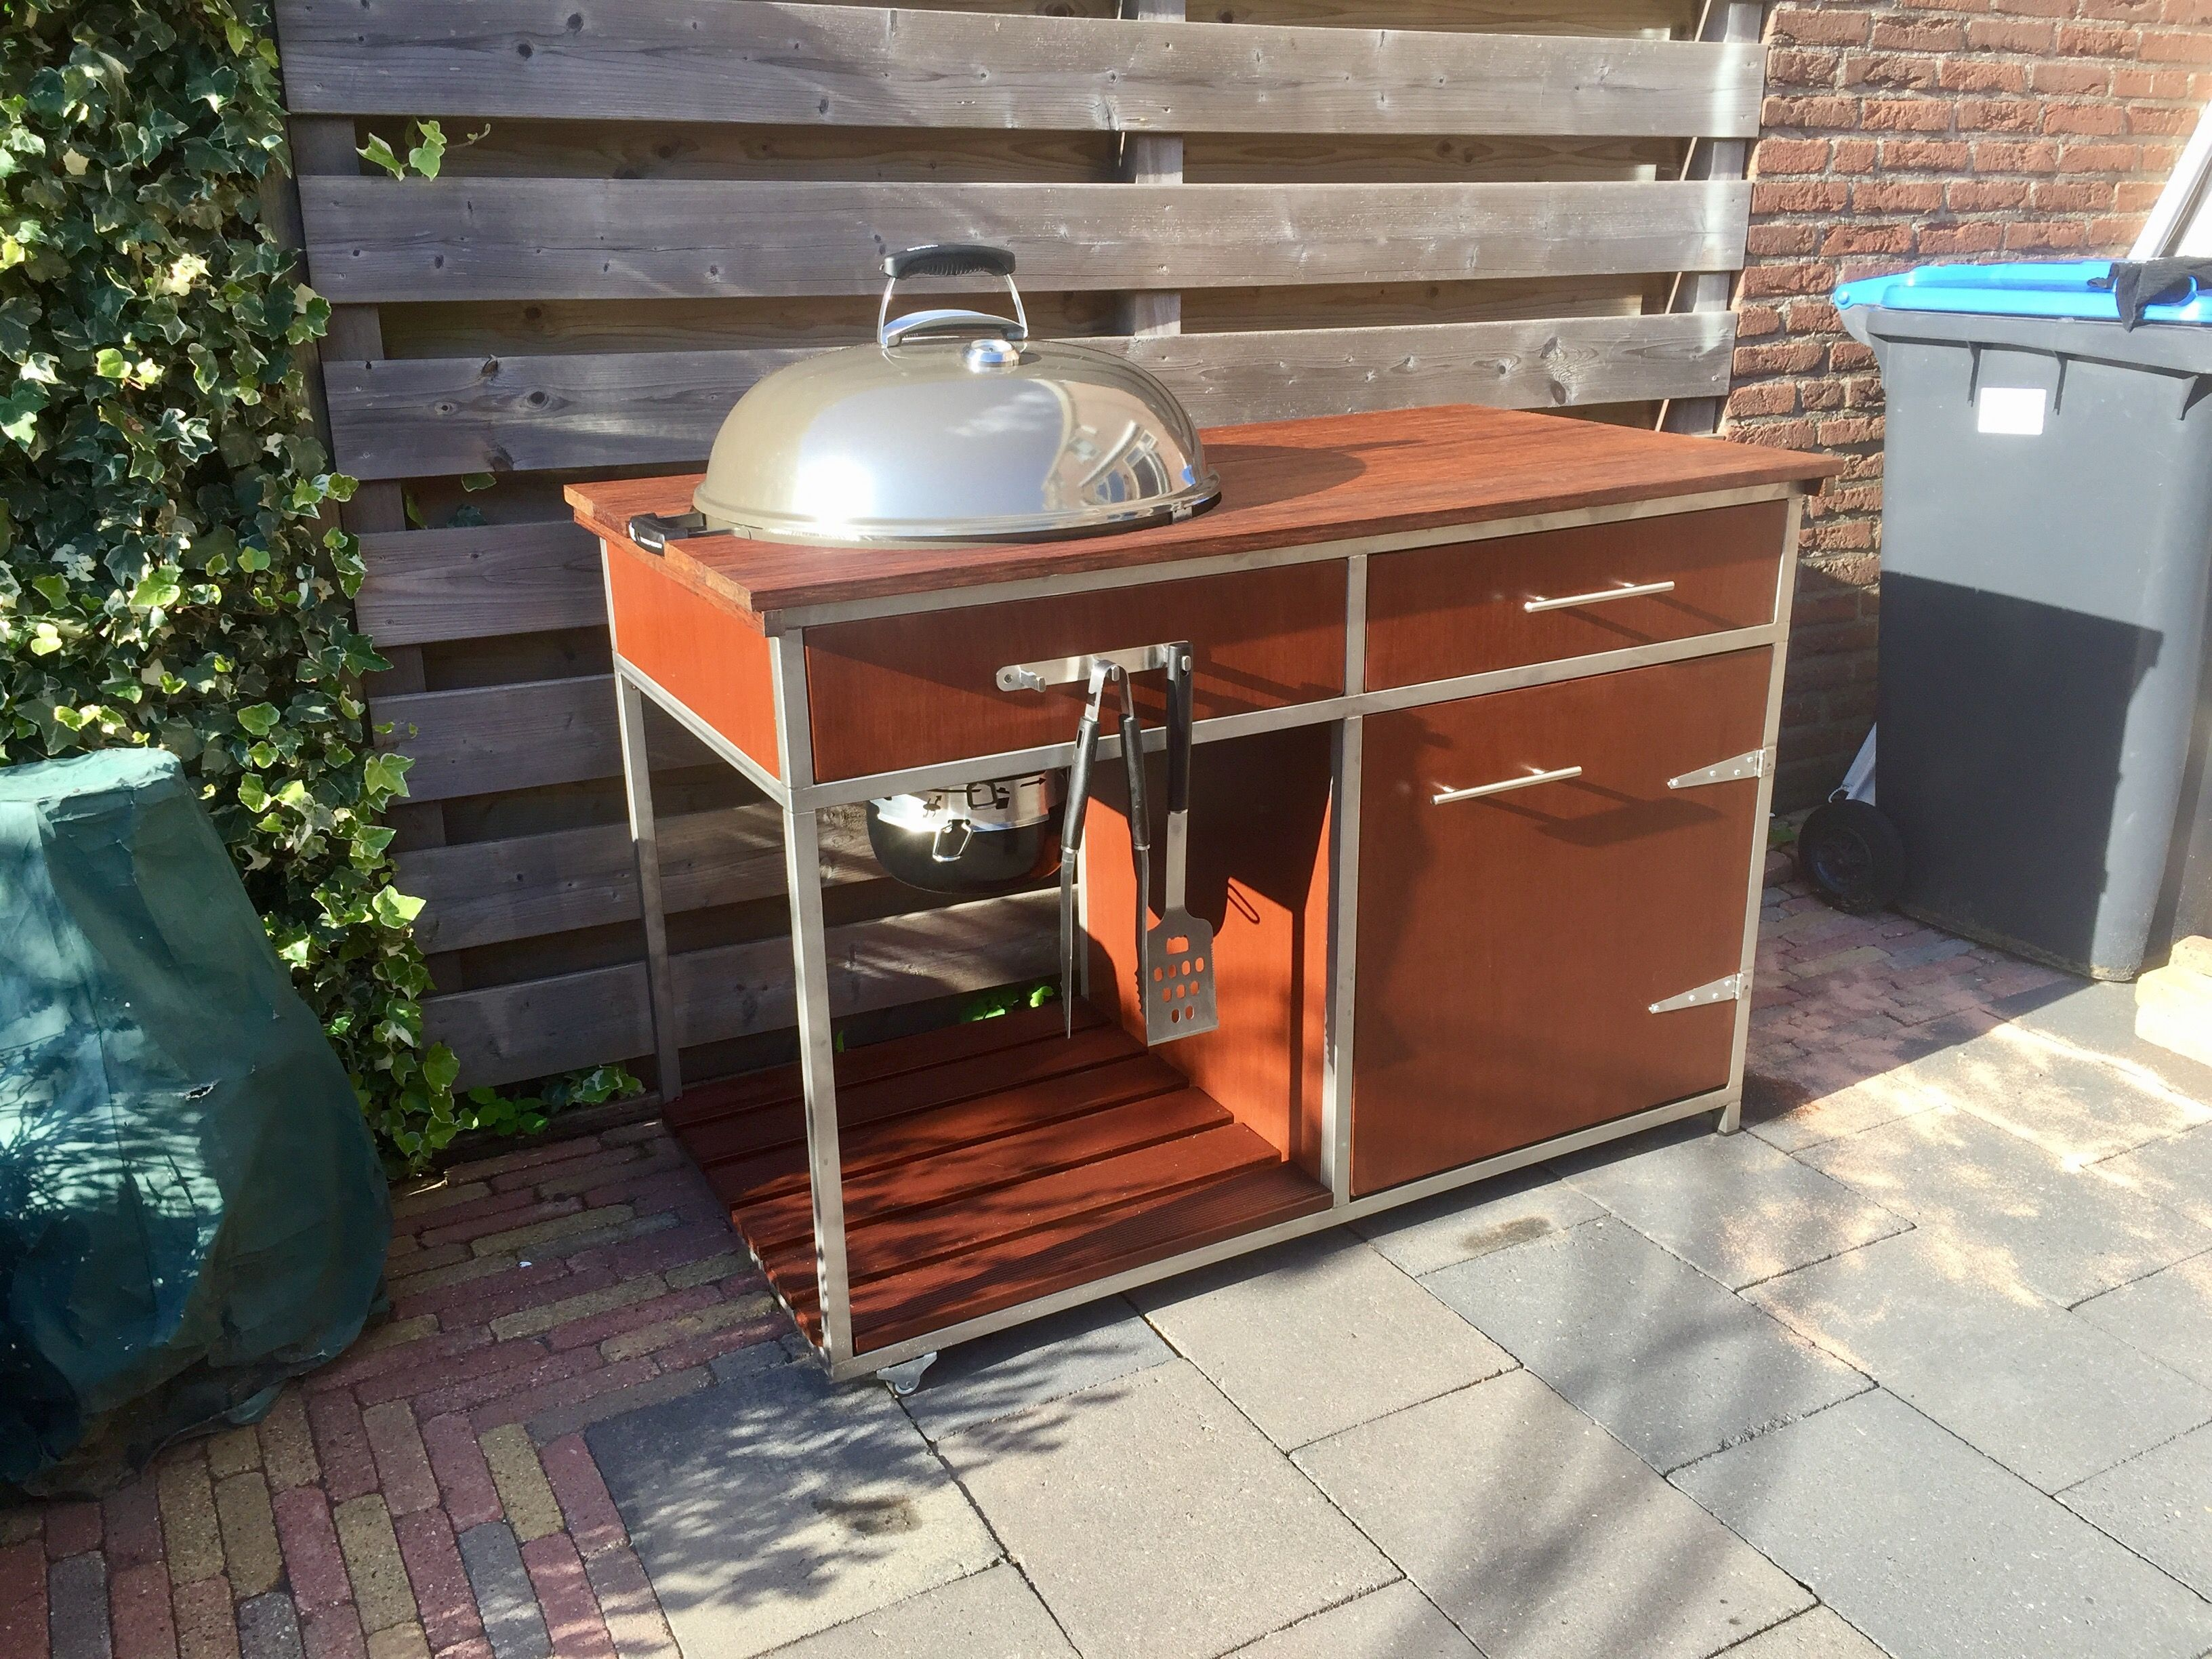 Outdoor Küche Weber Kugelgrill : Weber grill in outdoor küche integrieren outdoorküche gemauert mit